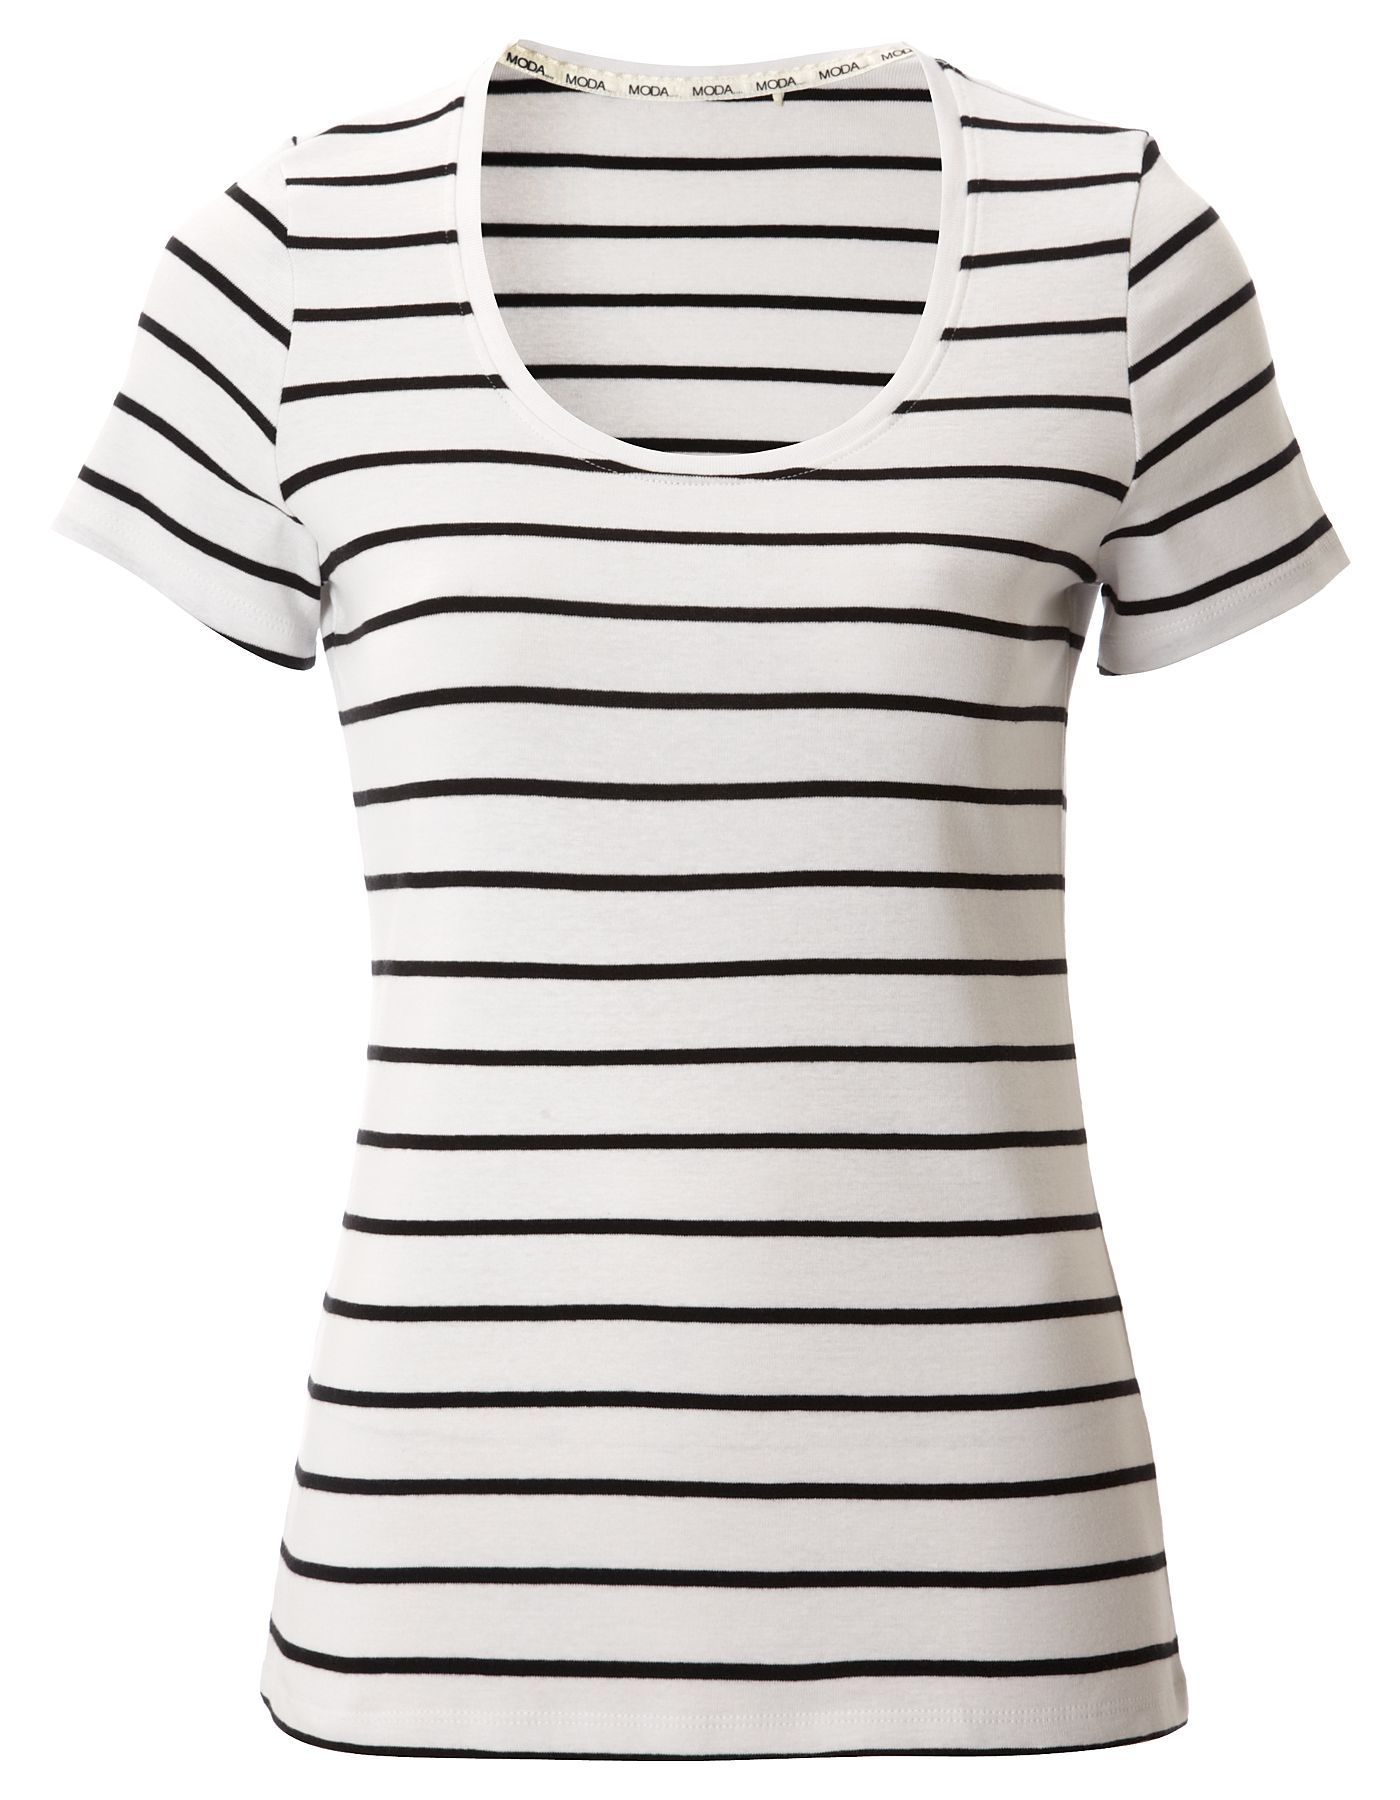 Black t shirt asda - Moda Striped T Shirt Women George At Asda